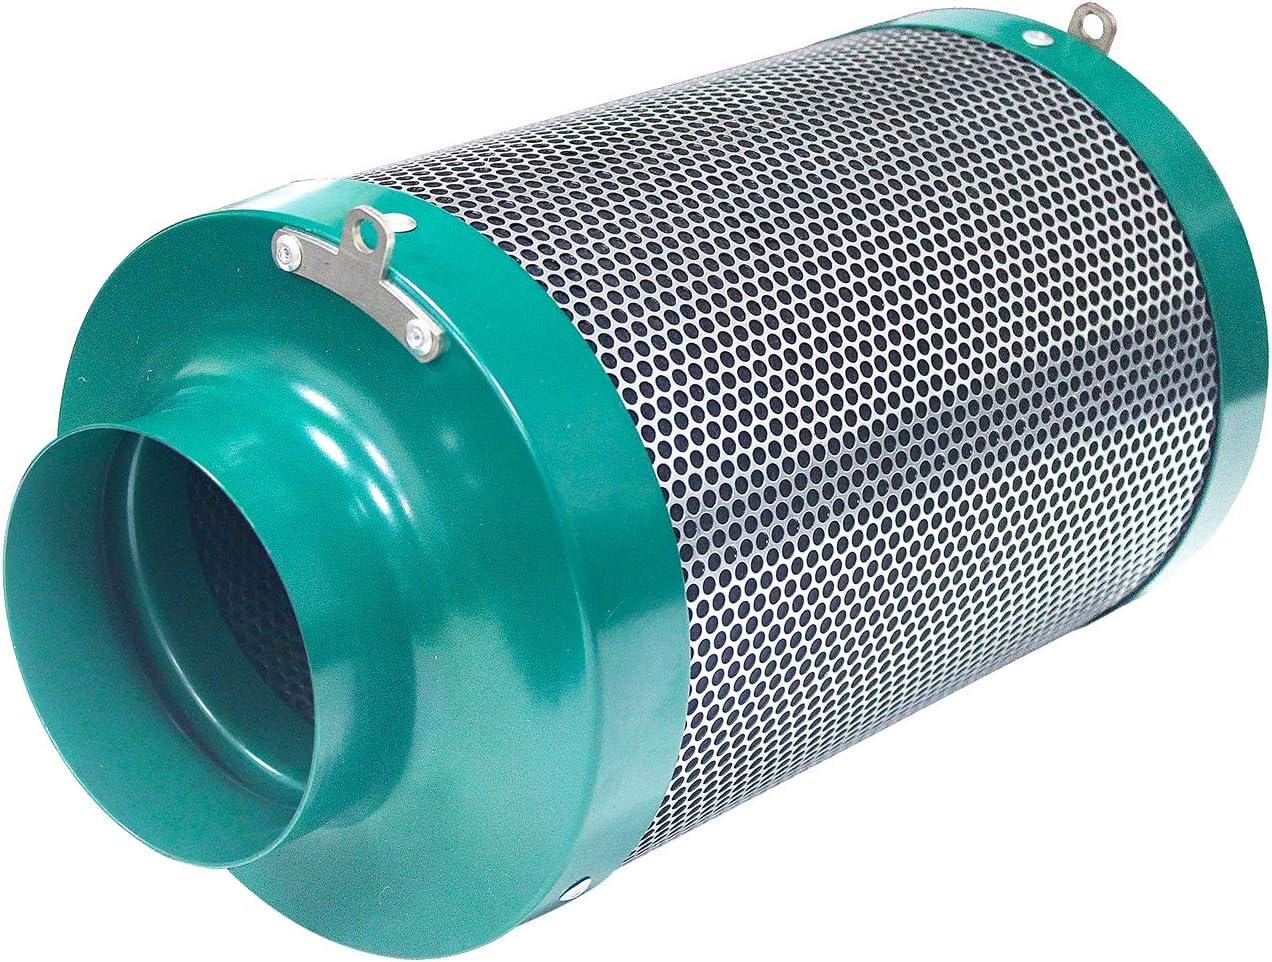 MELONFARM 4 Inch Inline Air Carbon Filter Carbon Filter Odor Control Scrubber